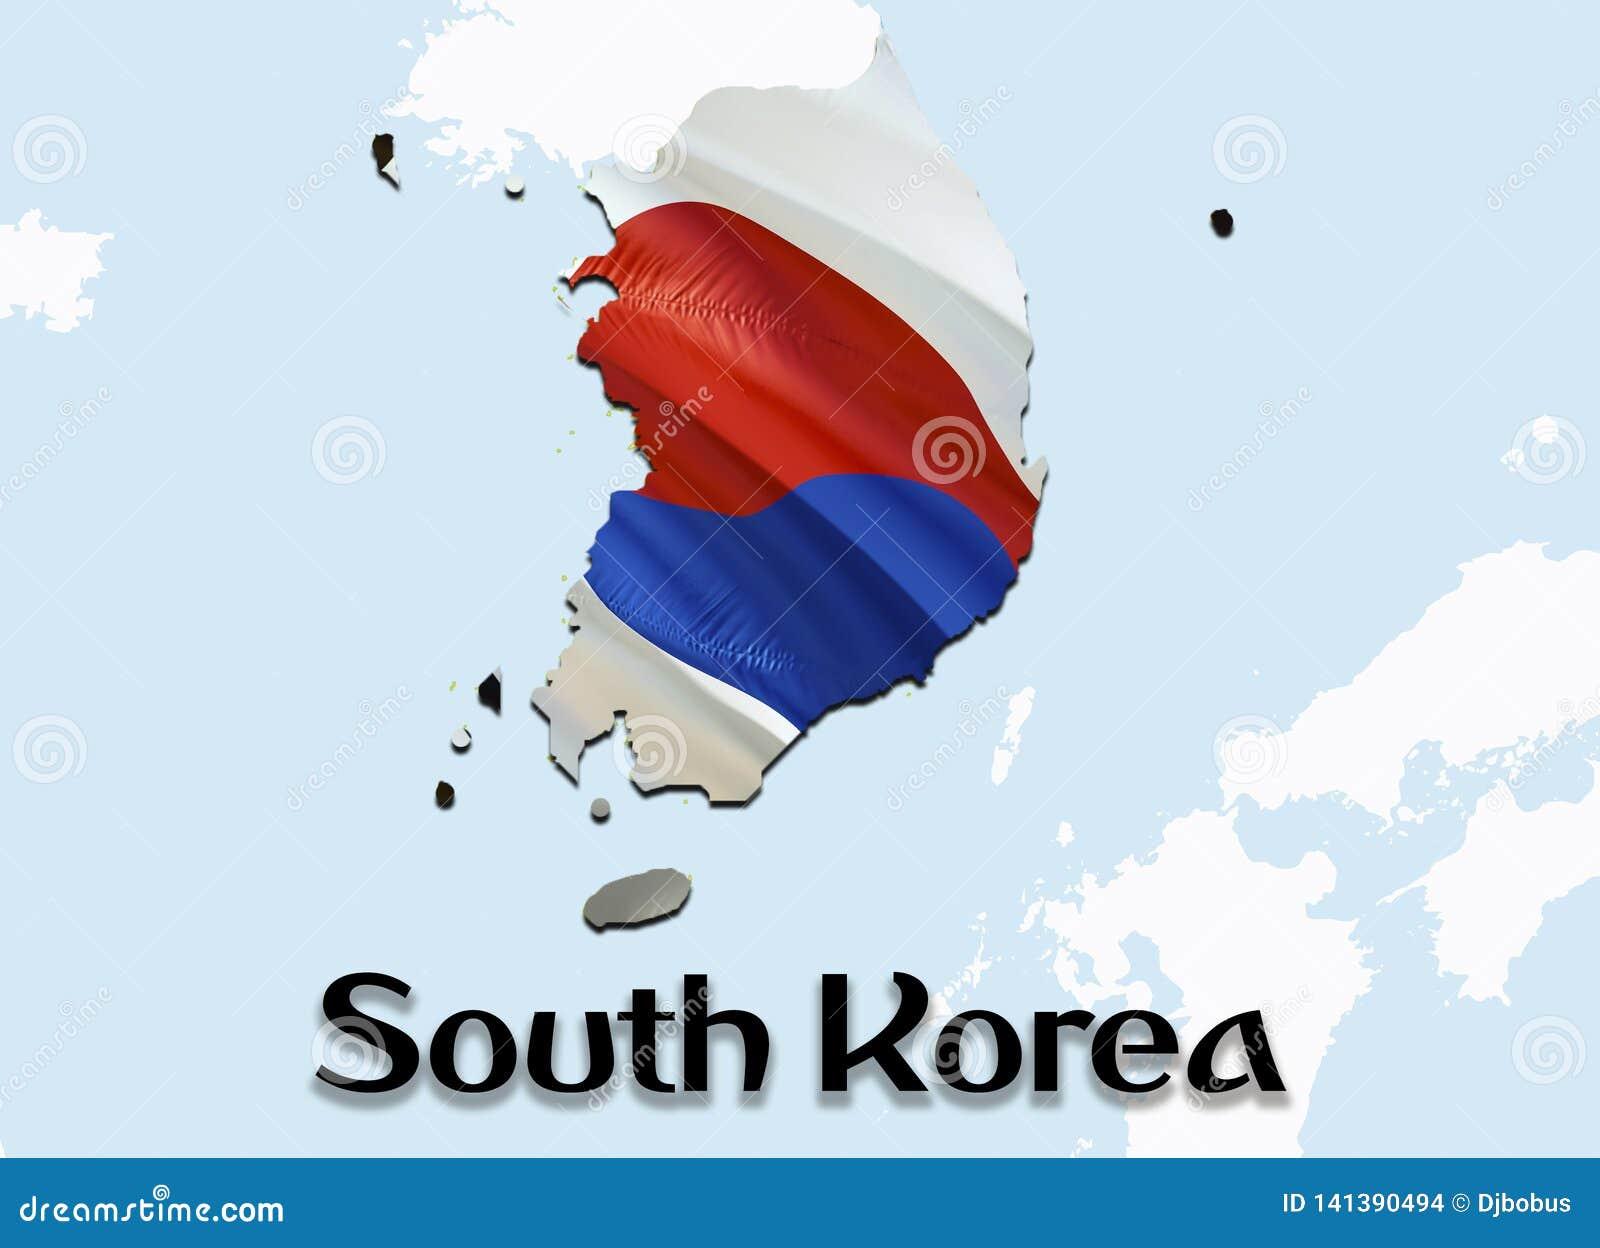 Korea Asia Map on north korea asia, germany map asia, ukraine map asia, qatar map asia, pyongyang map asia, russia map asia, bahamas map asia, history map asia, united arab emirates map asia, seoul map asia, mali map asia, karakorum map asia, iran map asia, vietnam map asia, indonesia map asia, south korea asia, israel map asia, east timor map asia, macau map asia, japan map asia,